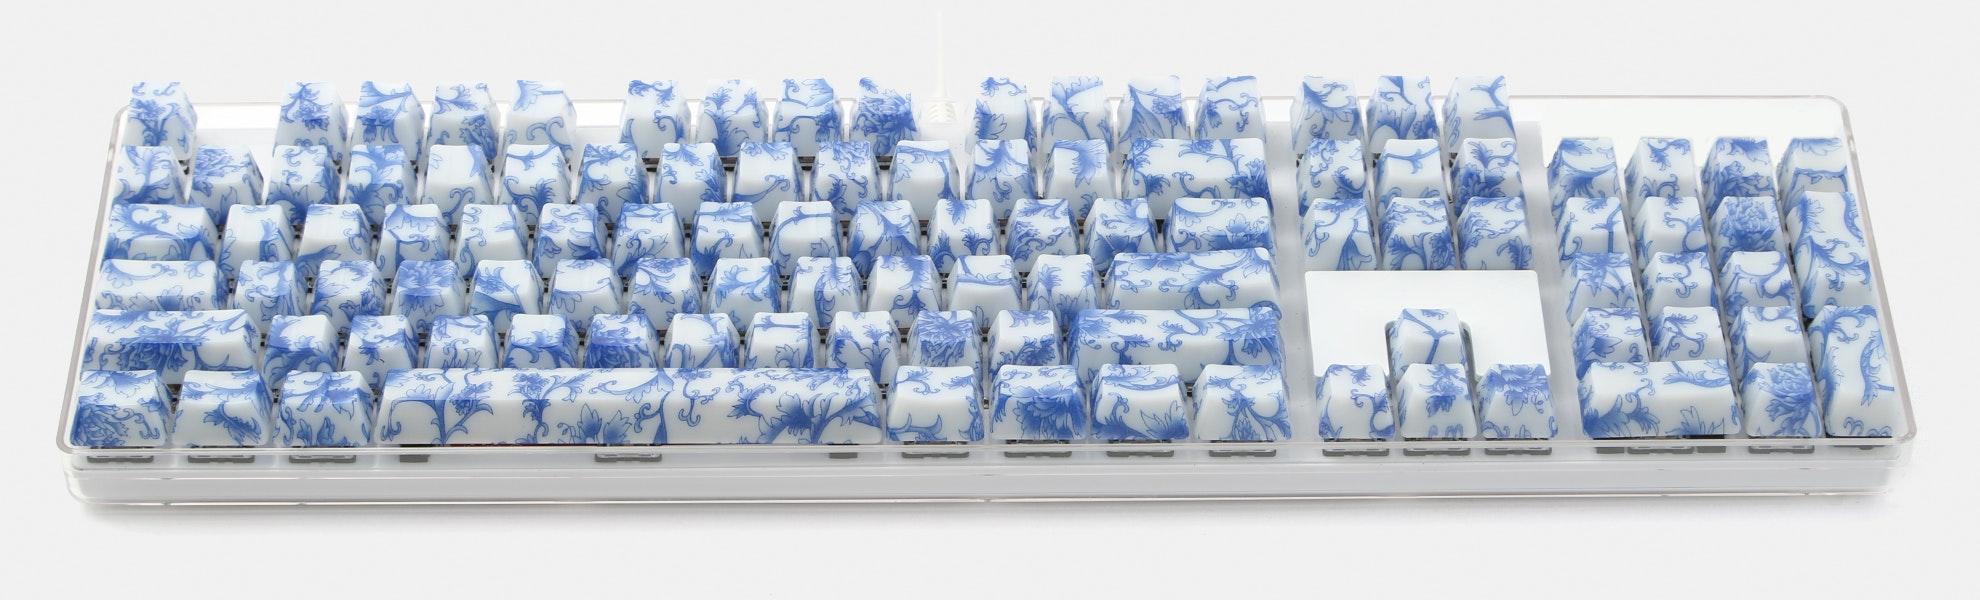 Imperial Porcelain ABS Keycap Set